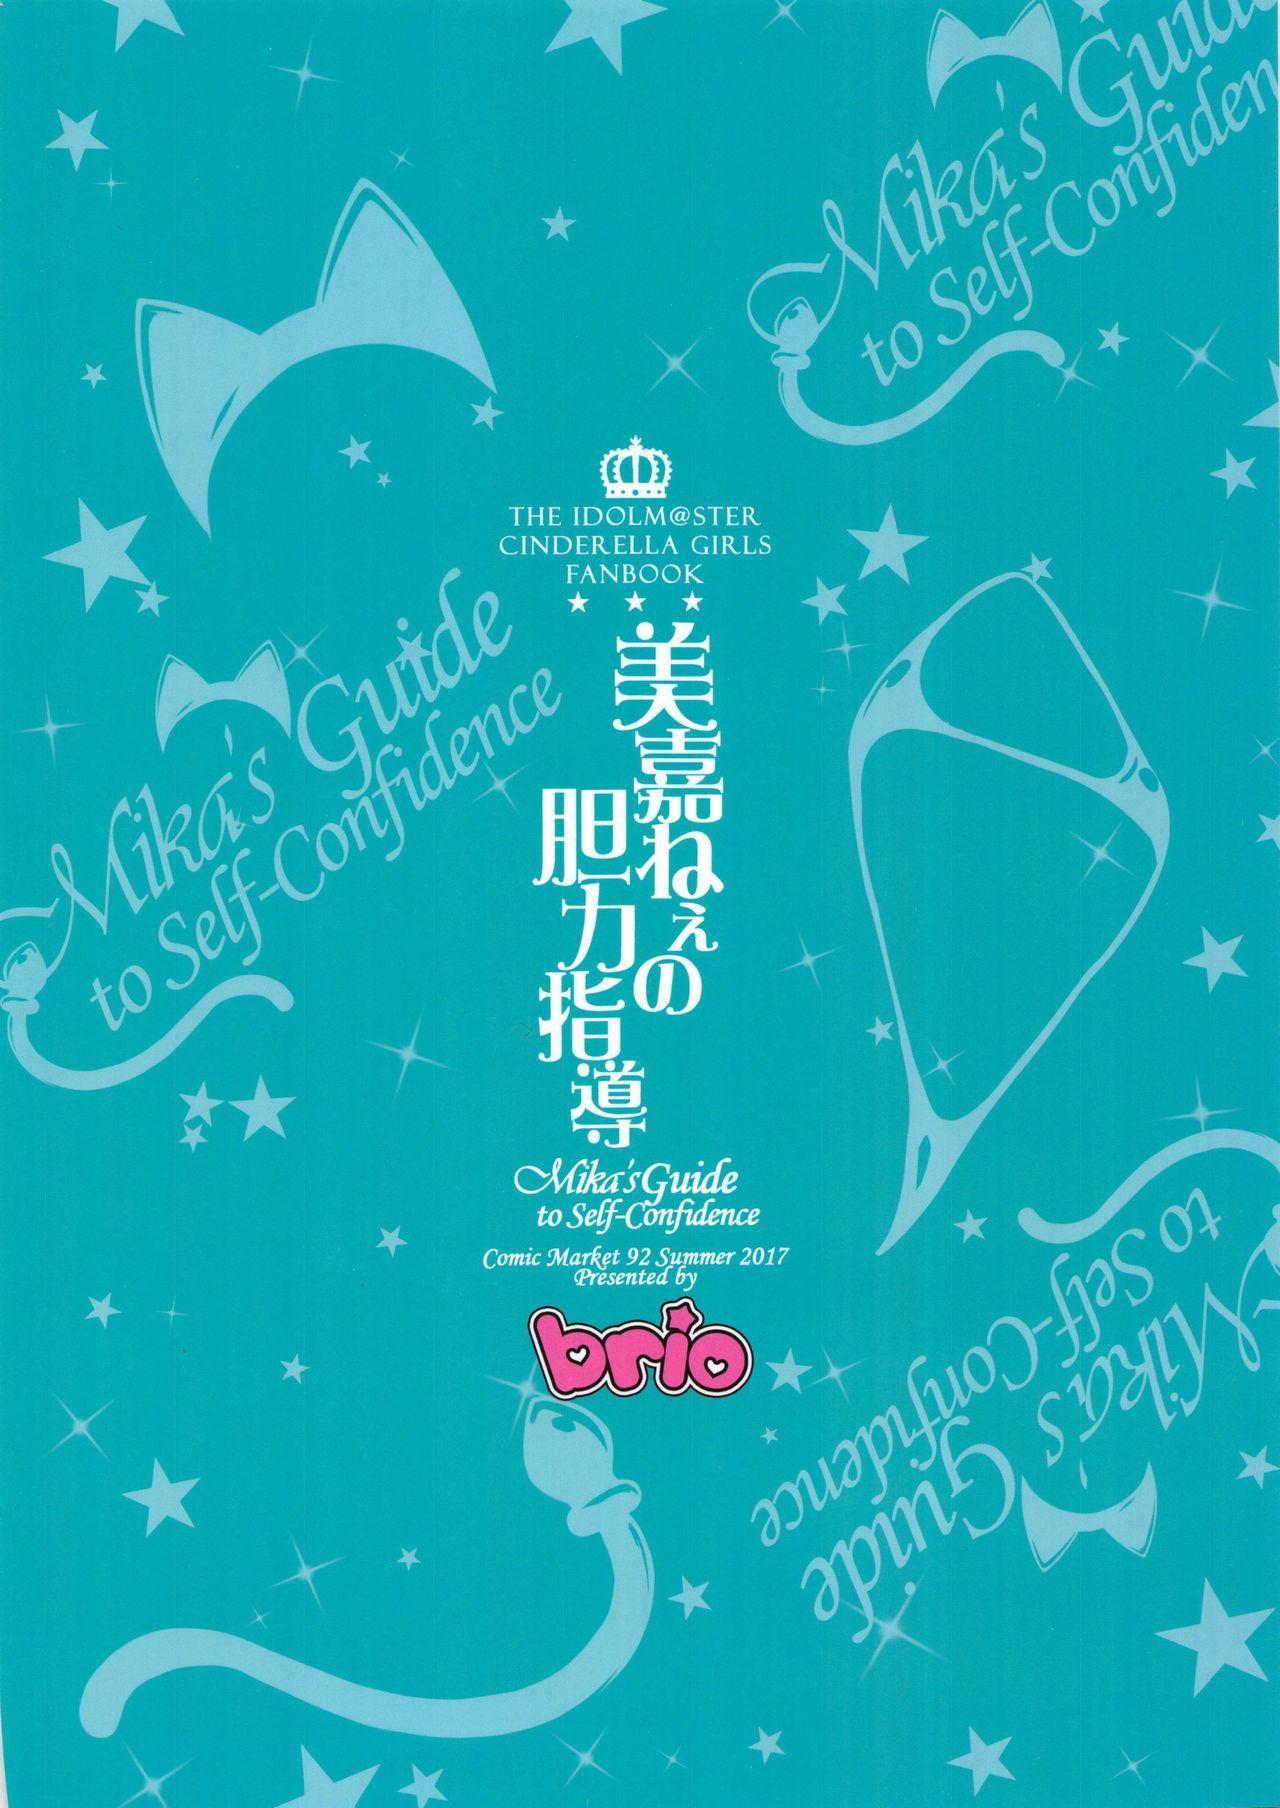 (C92) [BRIO (Puyocha)] Mika-nee no Tanryoku Shidou - Mika's Guide to Self-Confidence (THE IDOLM@STER CINDERELLA GIRLS) [English] {doujins.com} 25